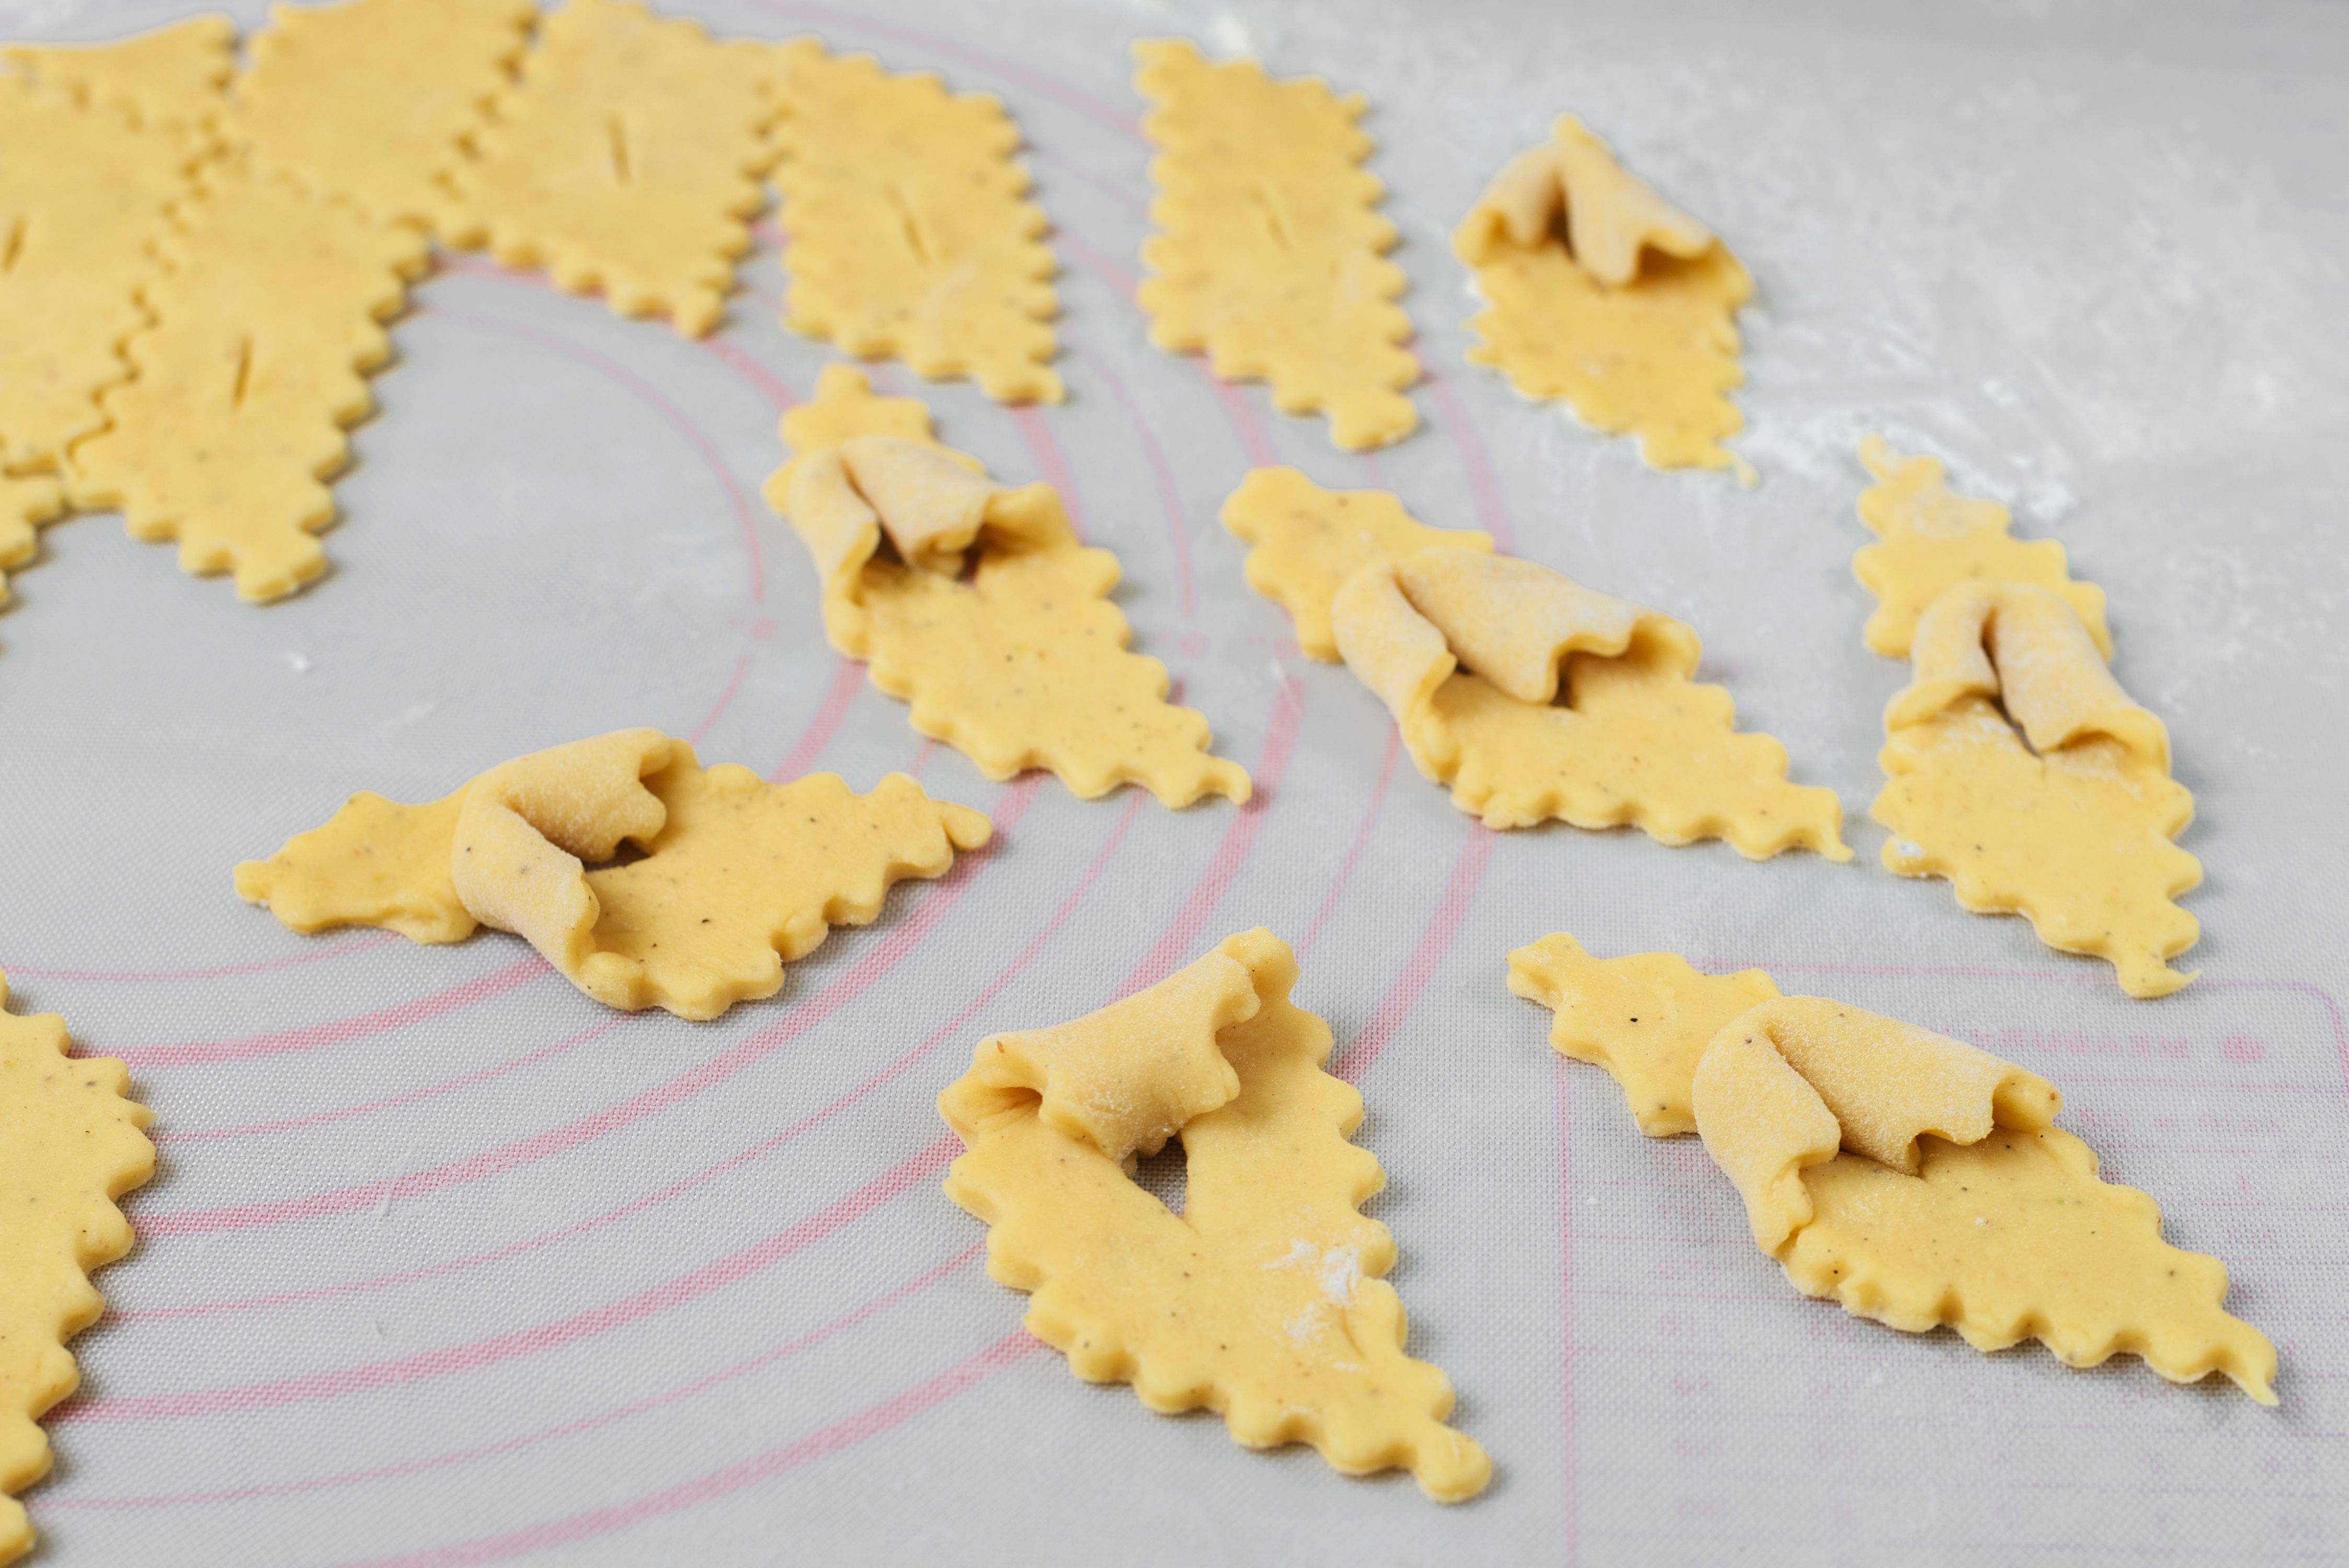 Corner of each diamond folded into slit for Poor Man Cookies